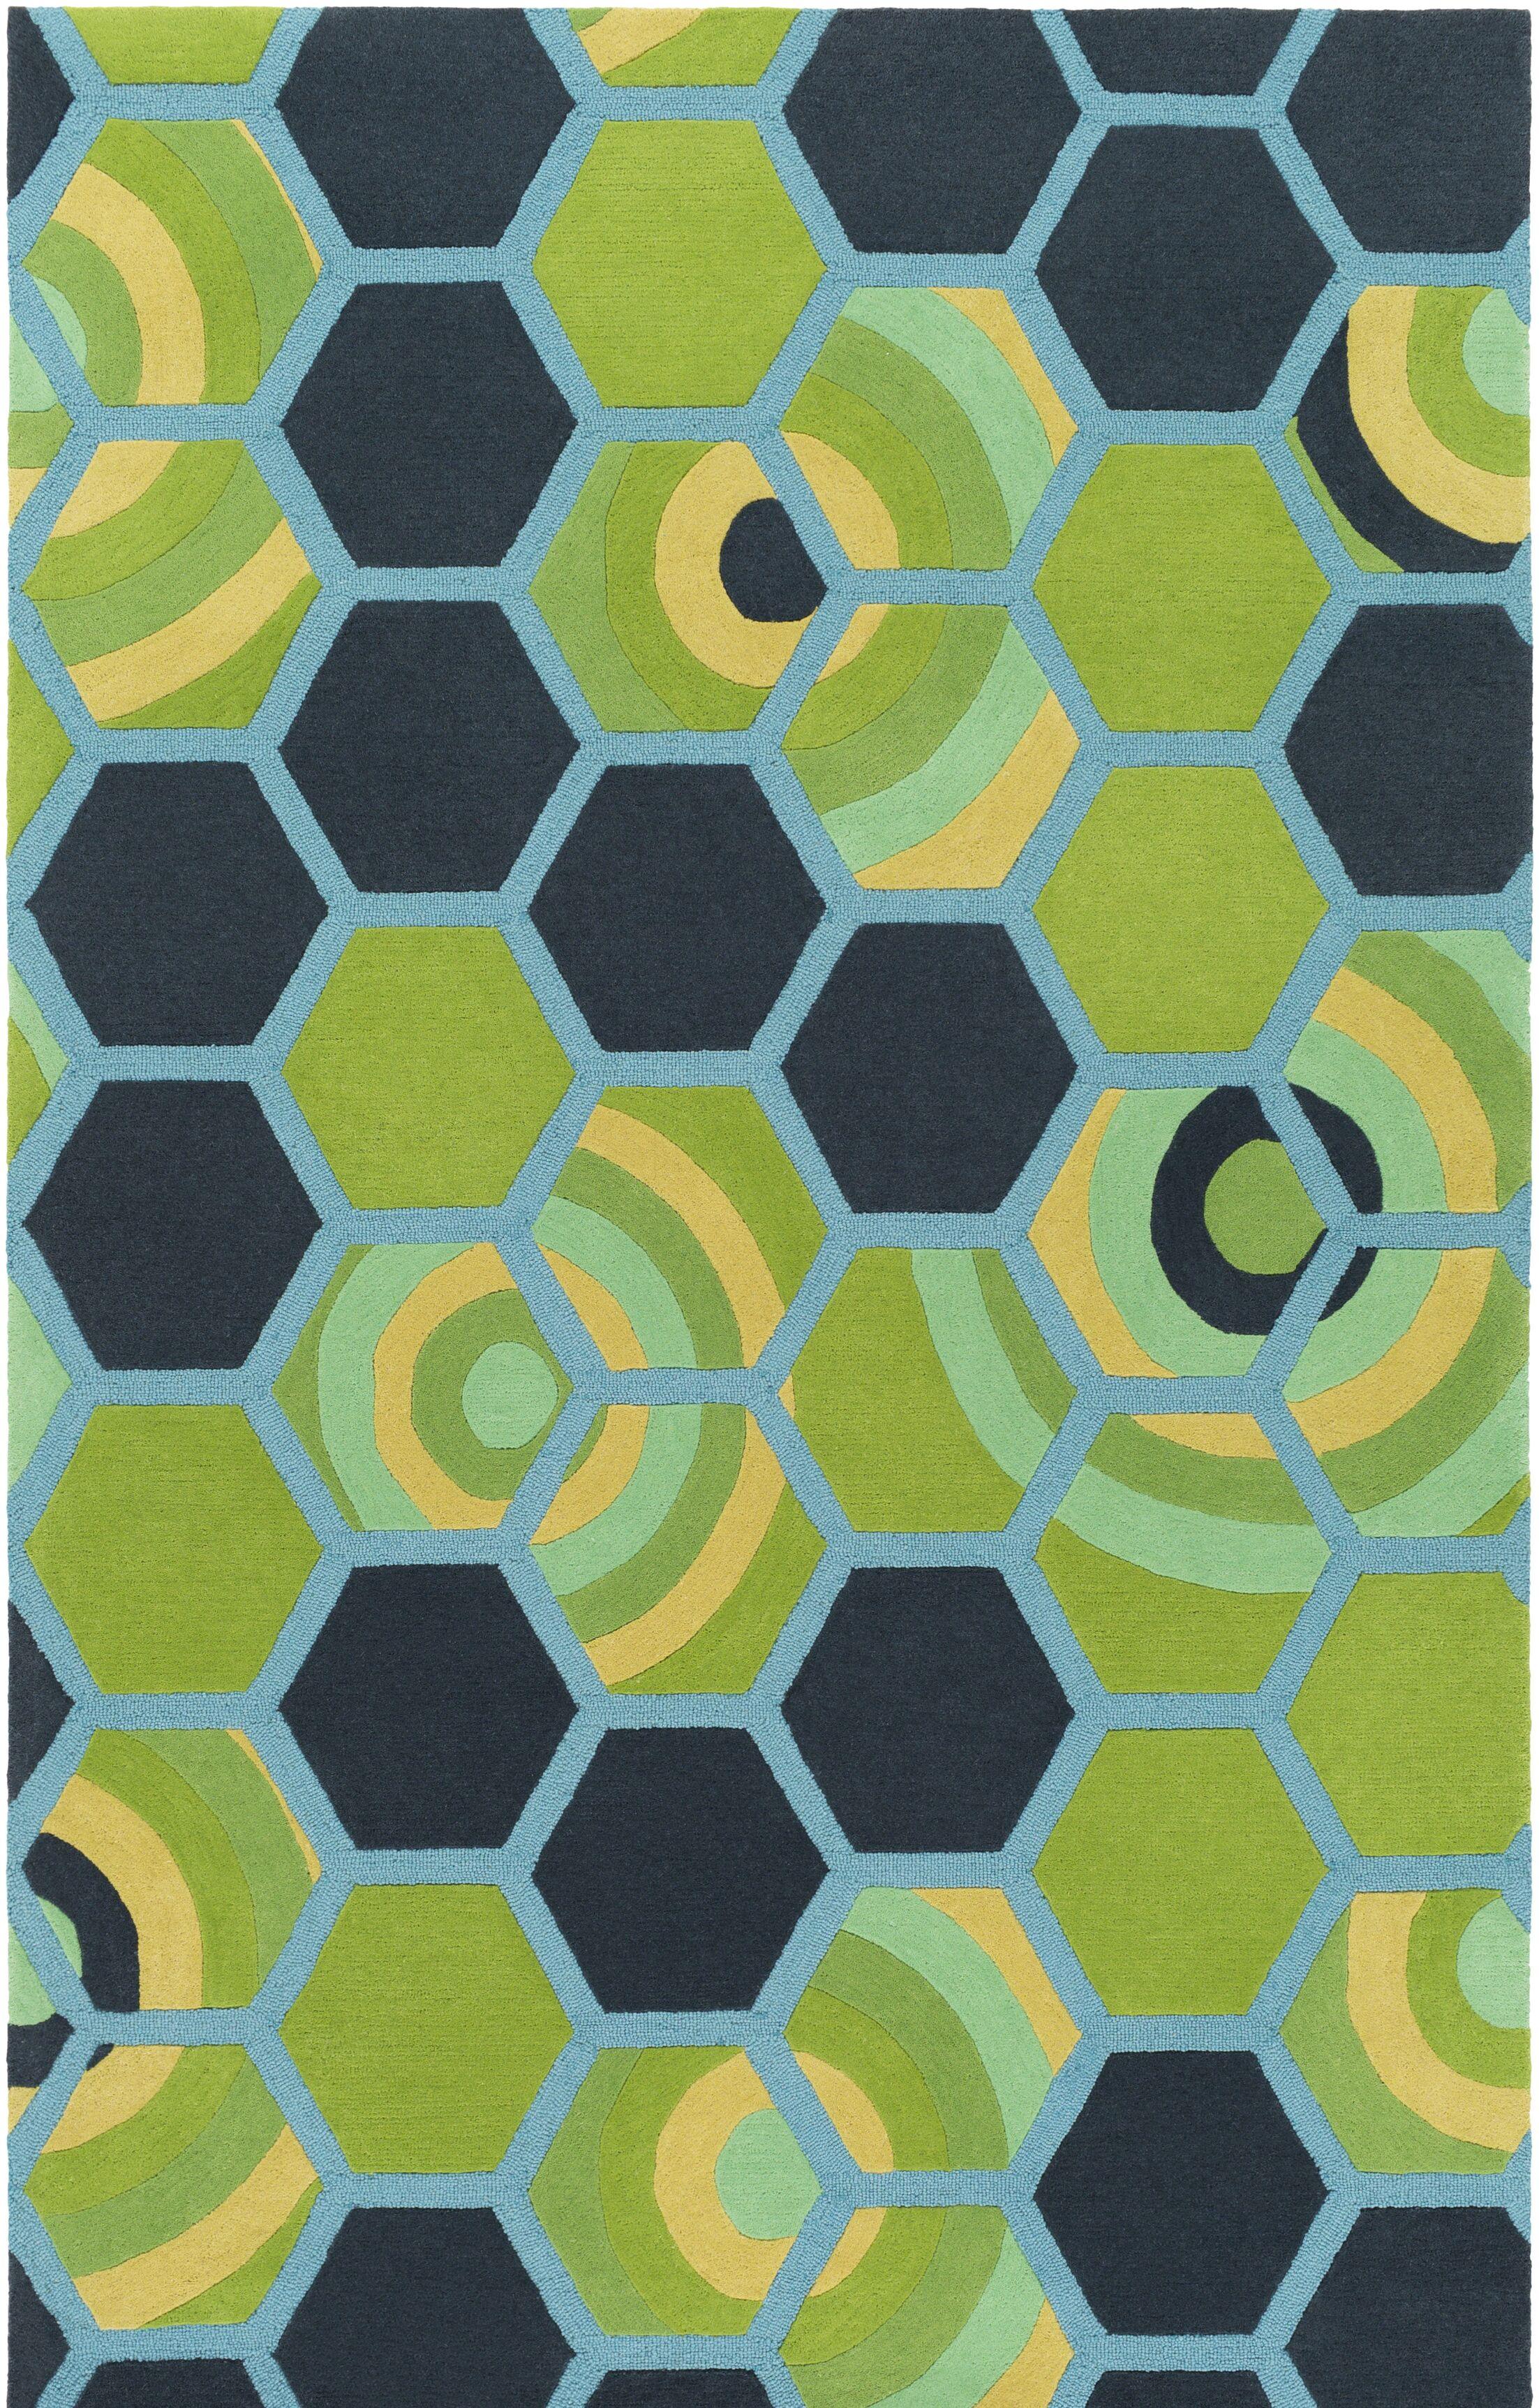 Kismet Honeycomb Hand-Tufted Green/Blue Area Rug Rug Size: Rectangle 5' x 7'6